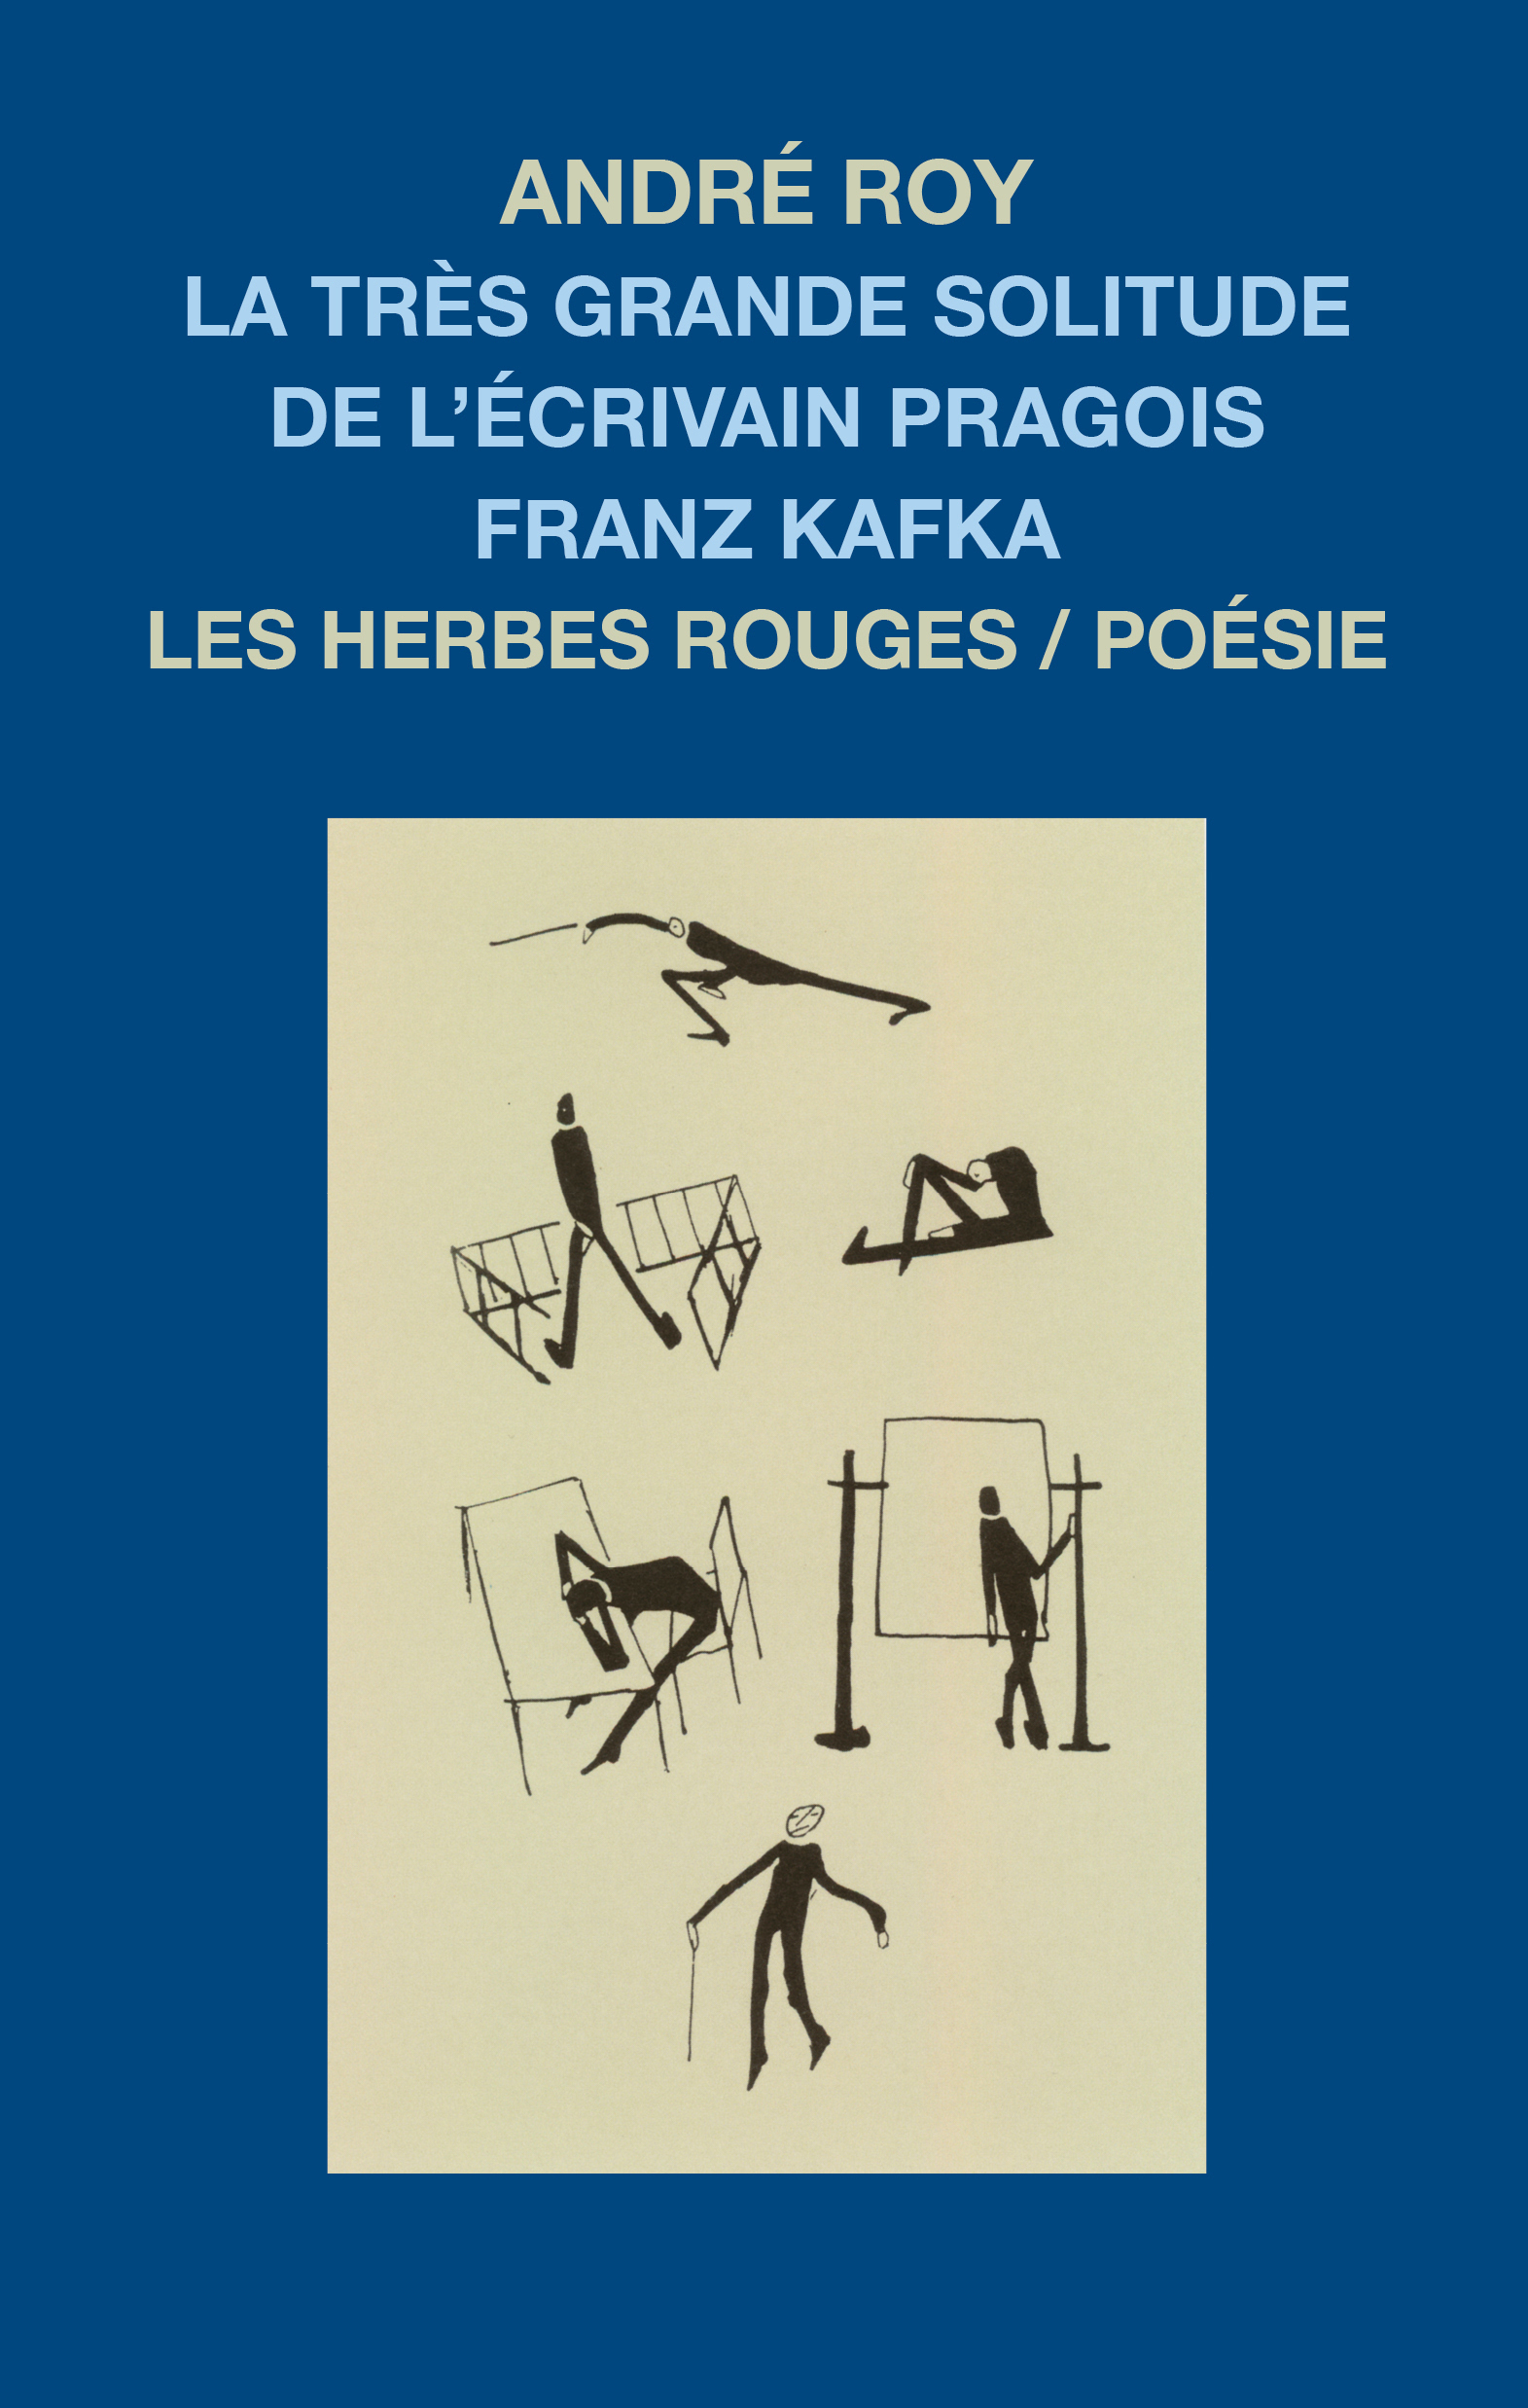 La très grande solitude de l'écrivain pragois Franz Kafka